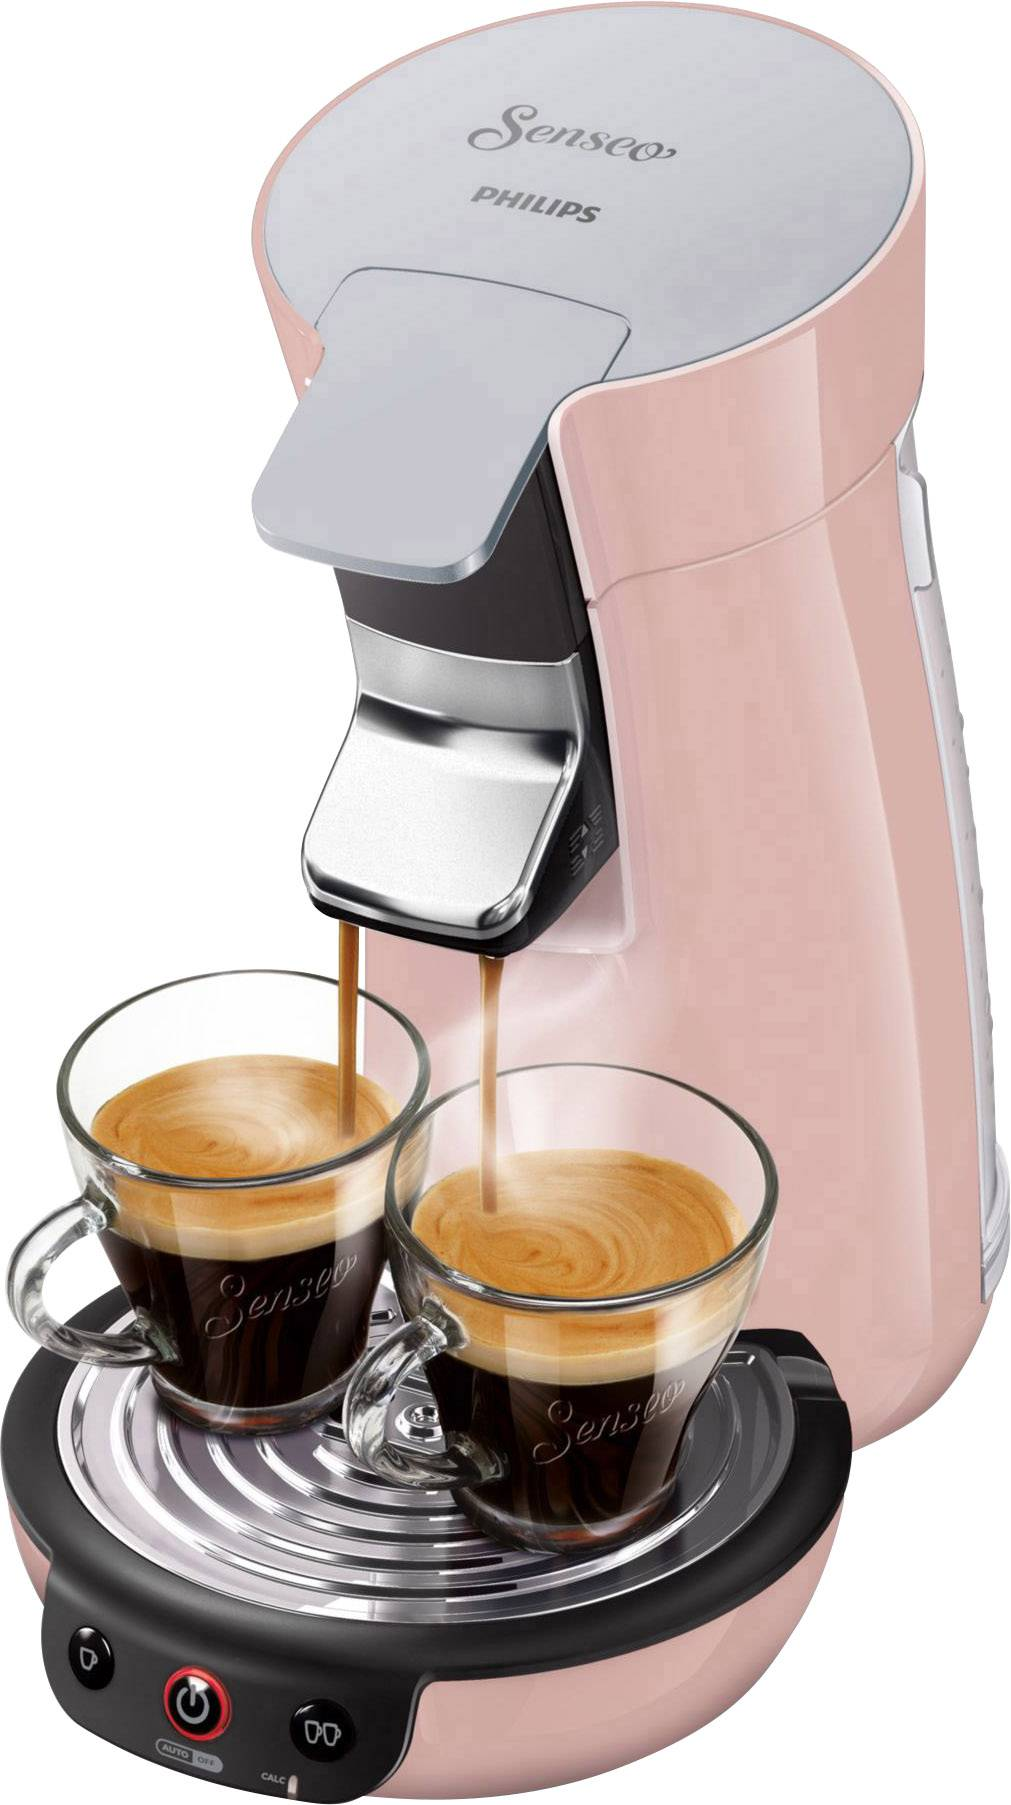 Senseo Viva Café Hd782930 Pod Coffee Machine Pink Conradcom